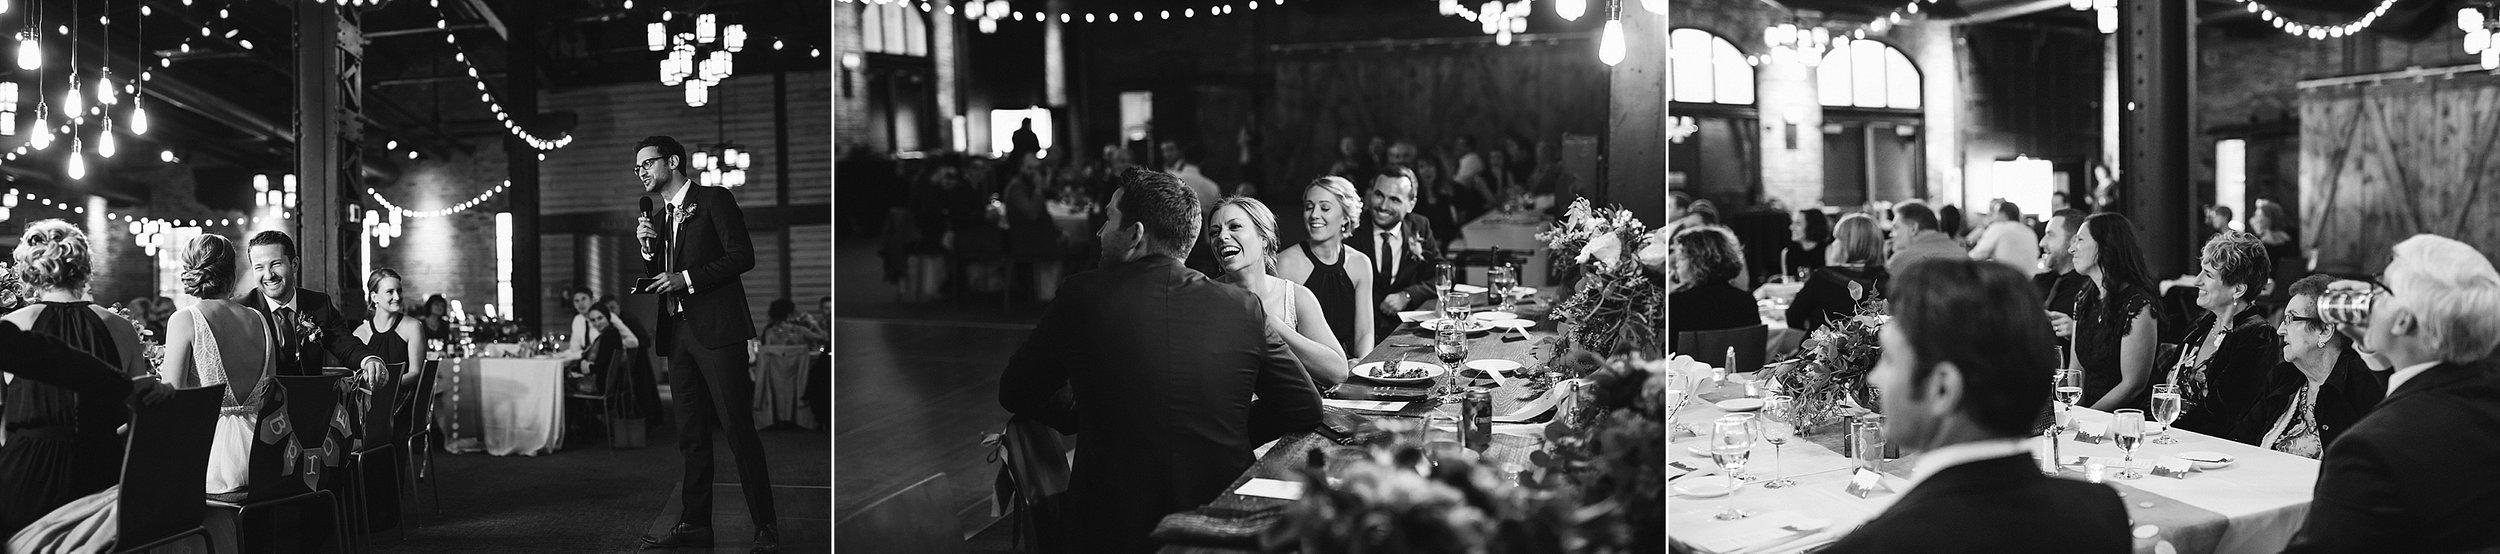 Nicollet-Island-Pavilion-Minneapolis-September-Coral-Navy-Wedding-150.jpg